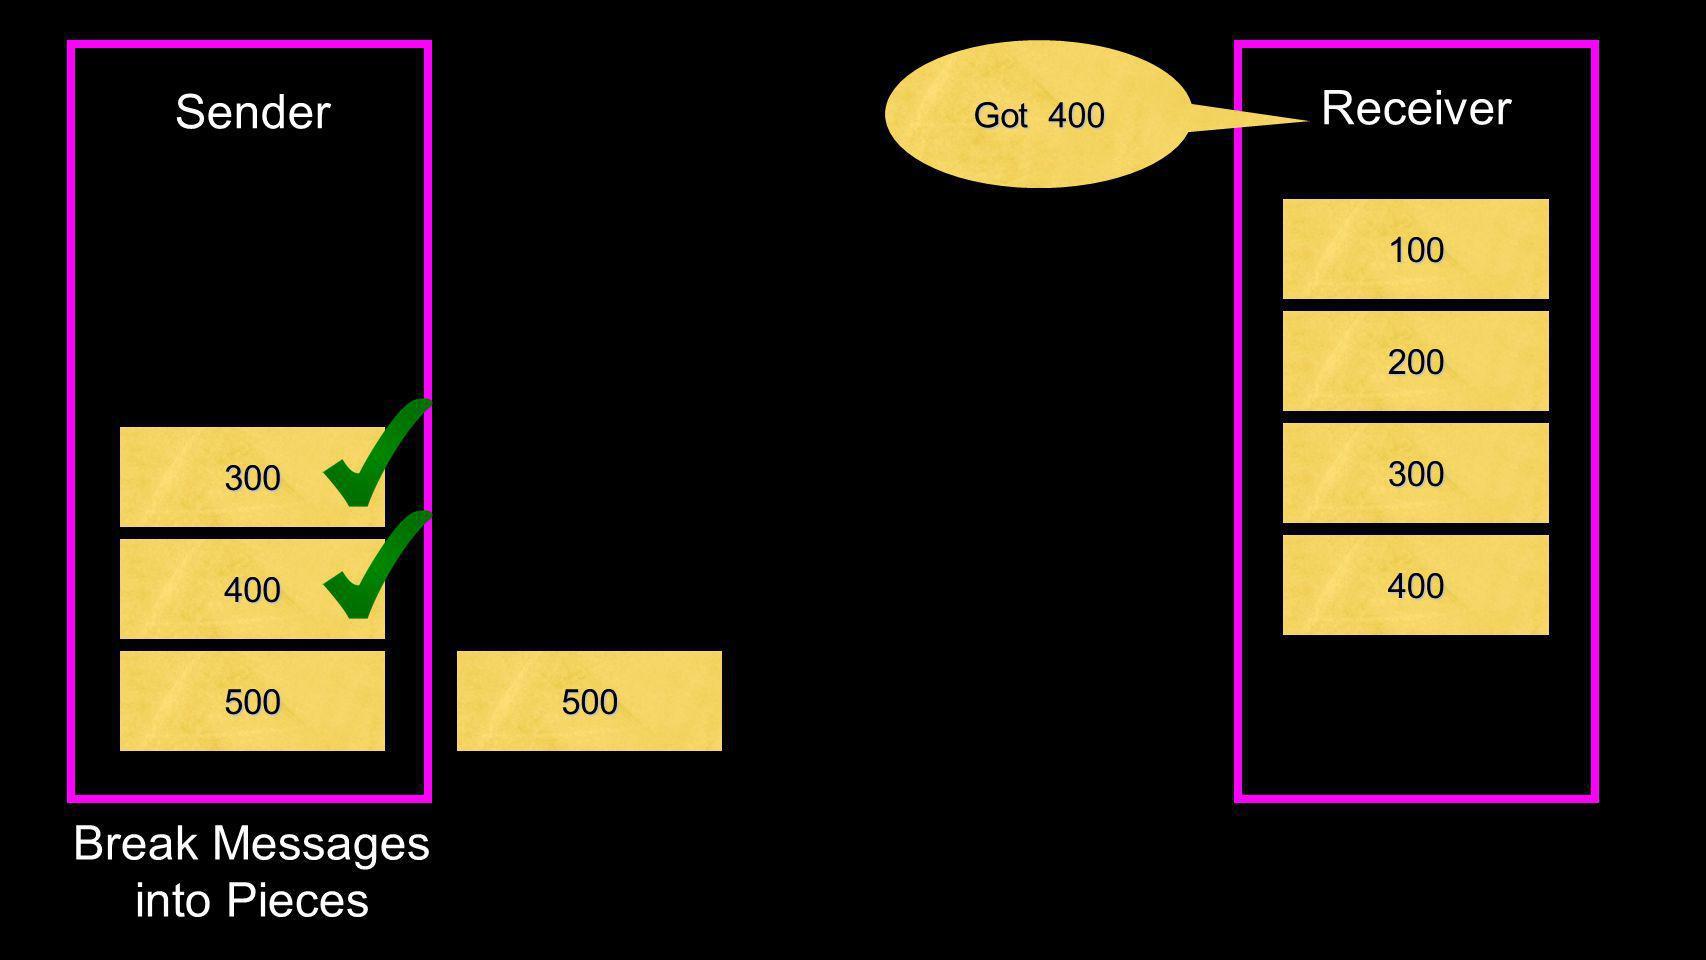 300 400 500 Break Messages into Pieces Sender 100 200 300 400 Receiver Got 400 500